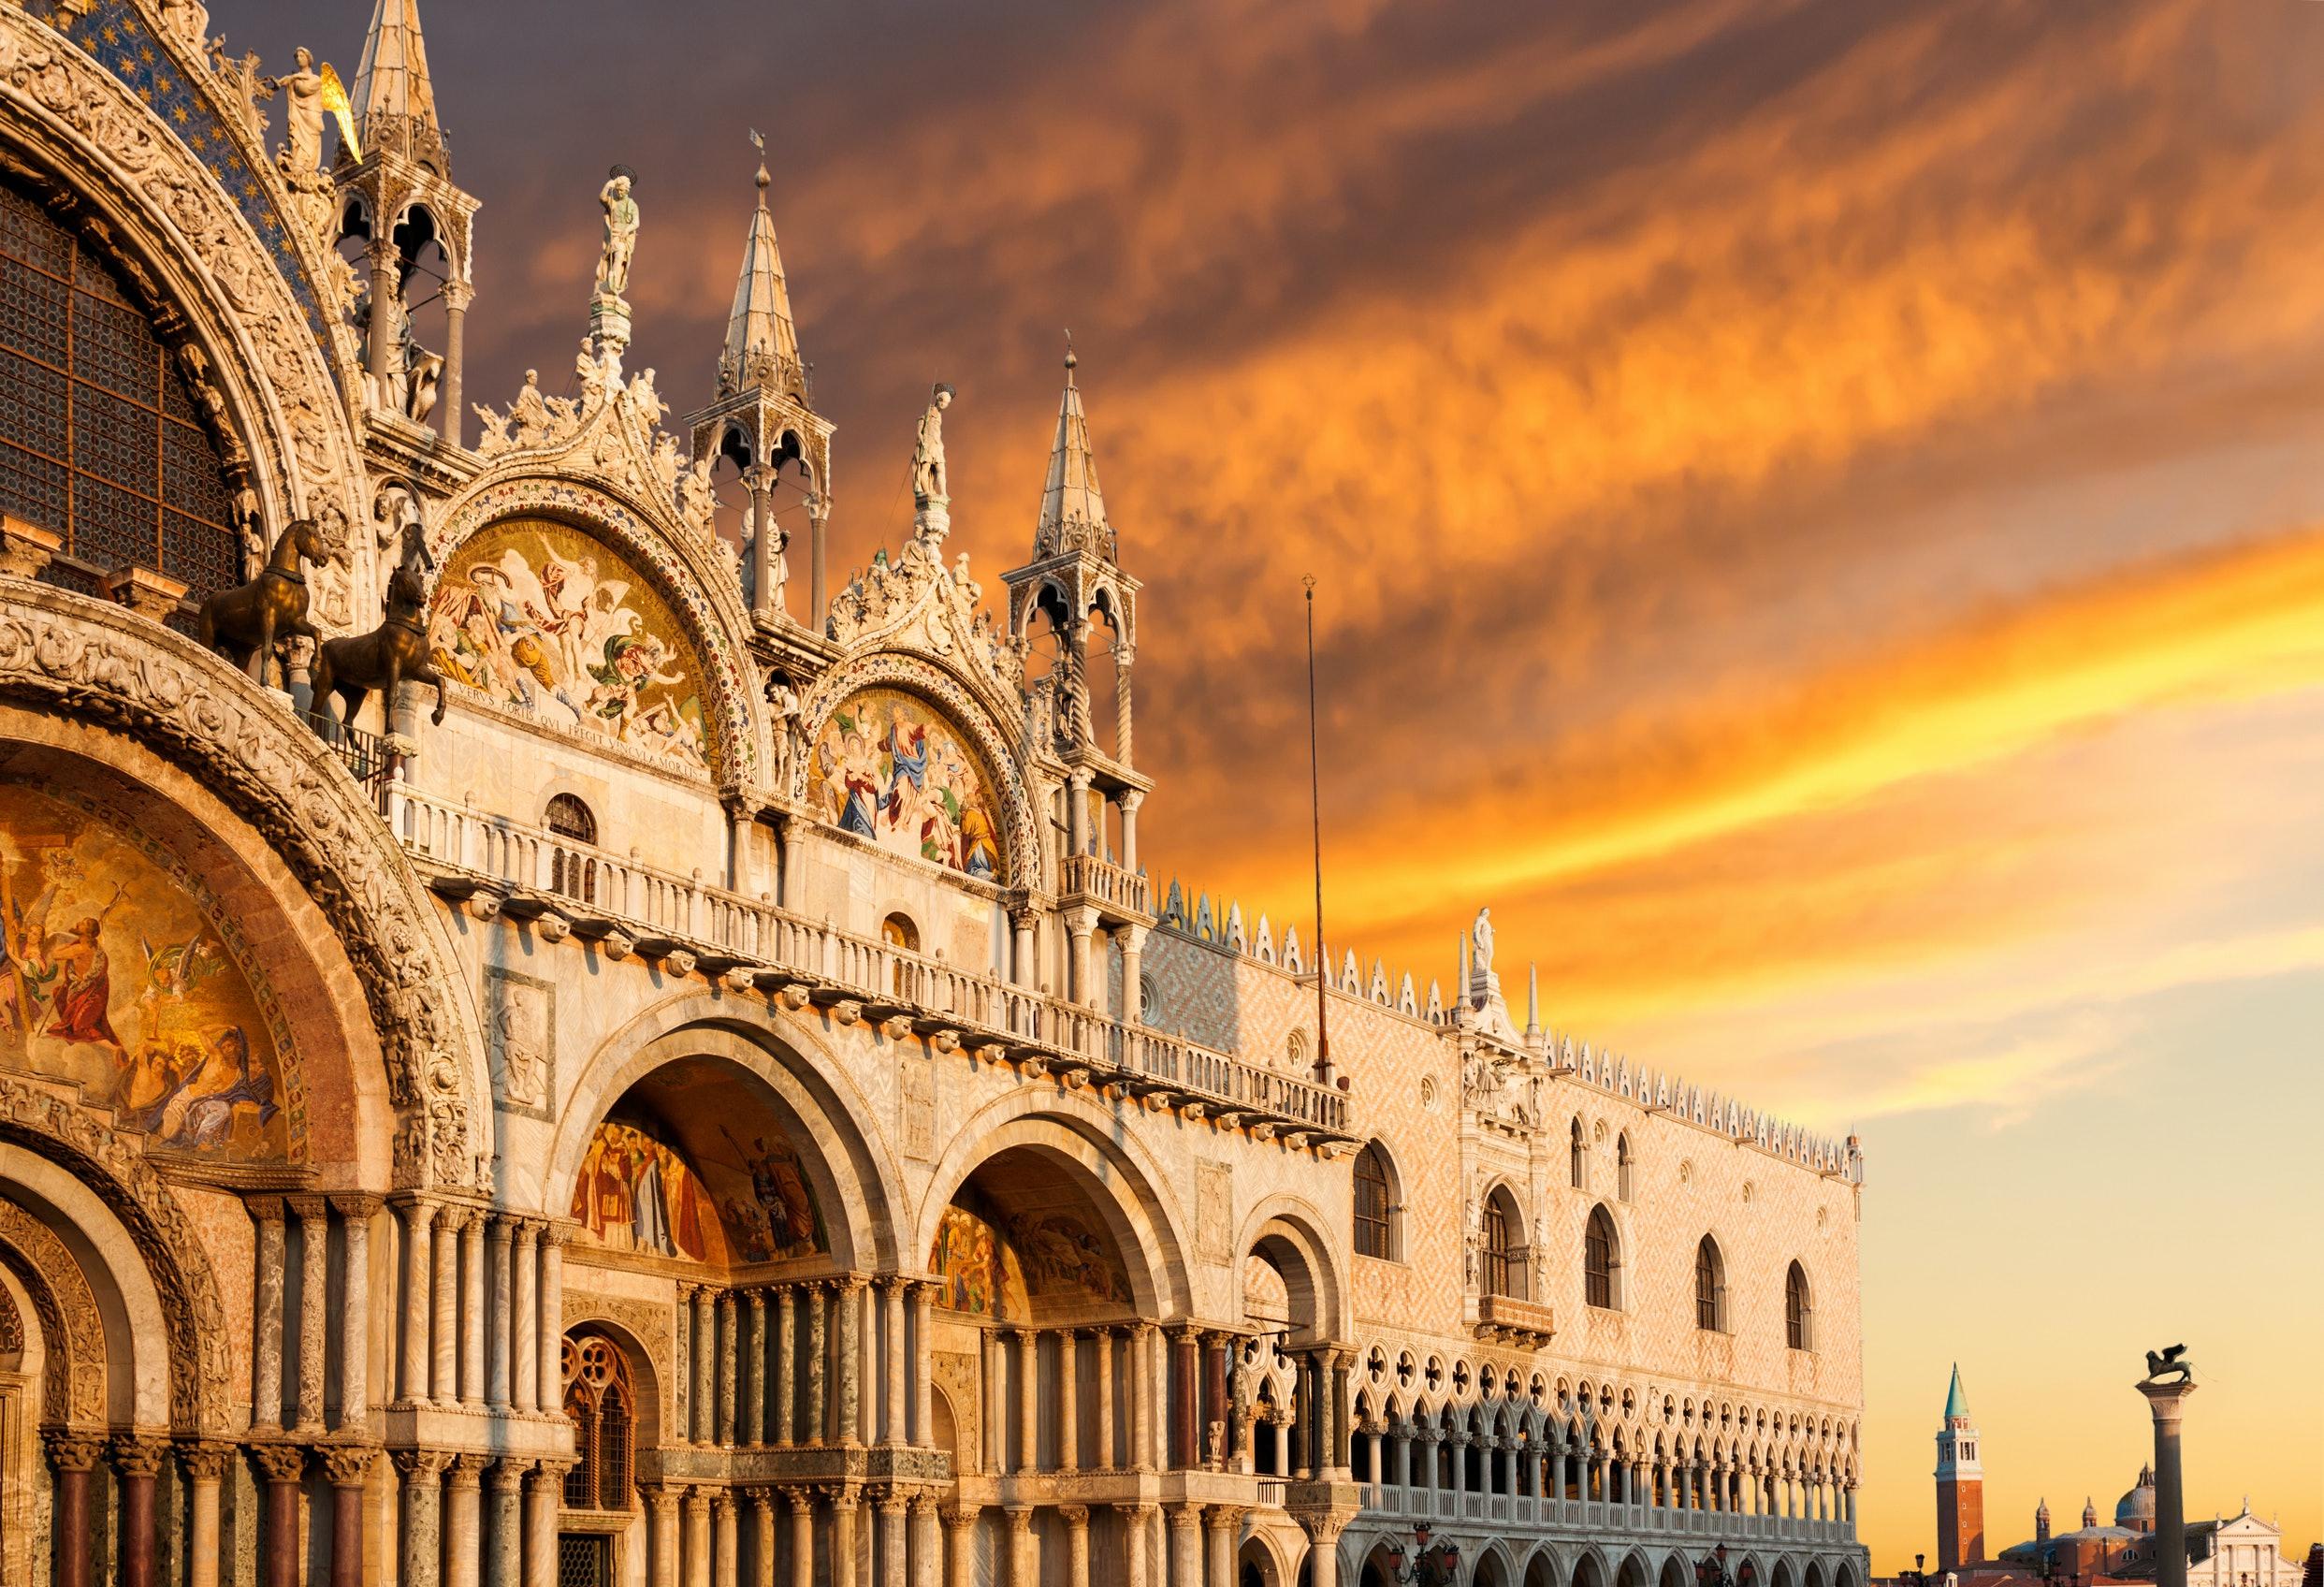 Skip The Line St Mark S Basilica Guided Tour